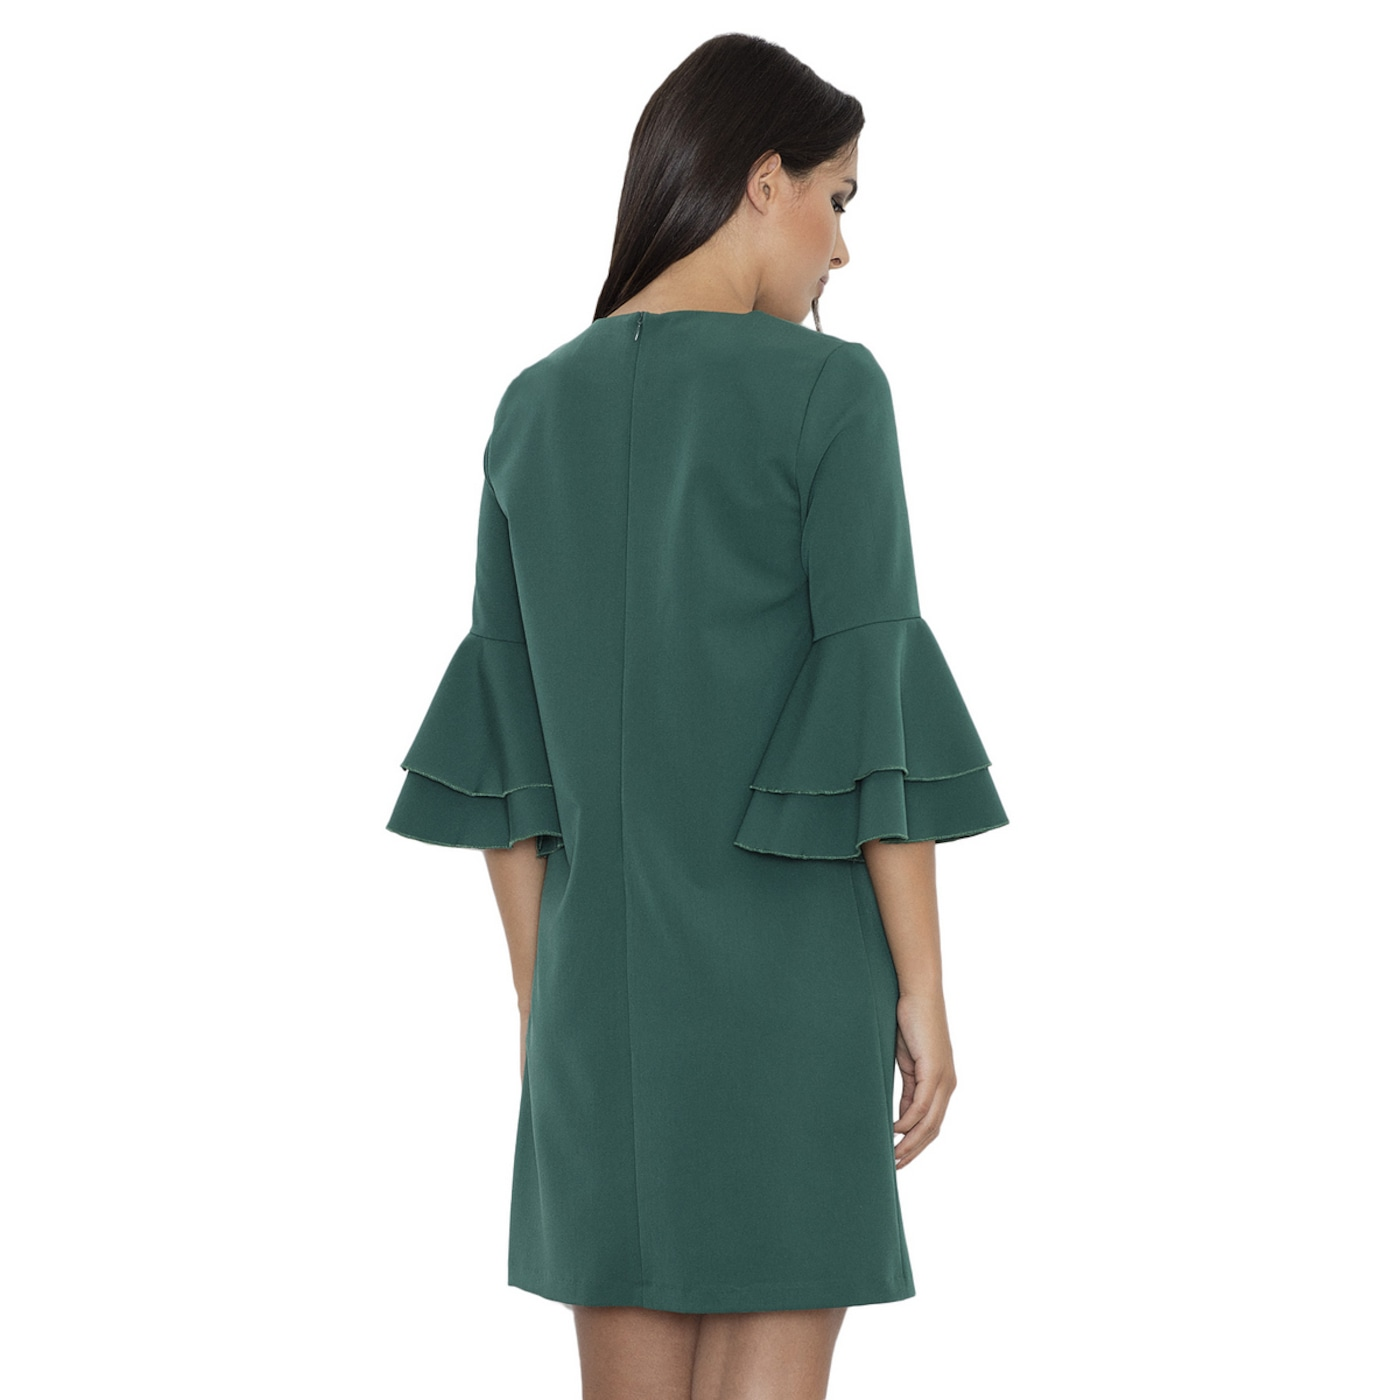 Figl Womans Dress M564 dámské Green M